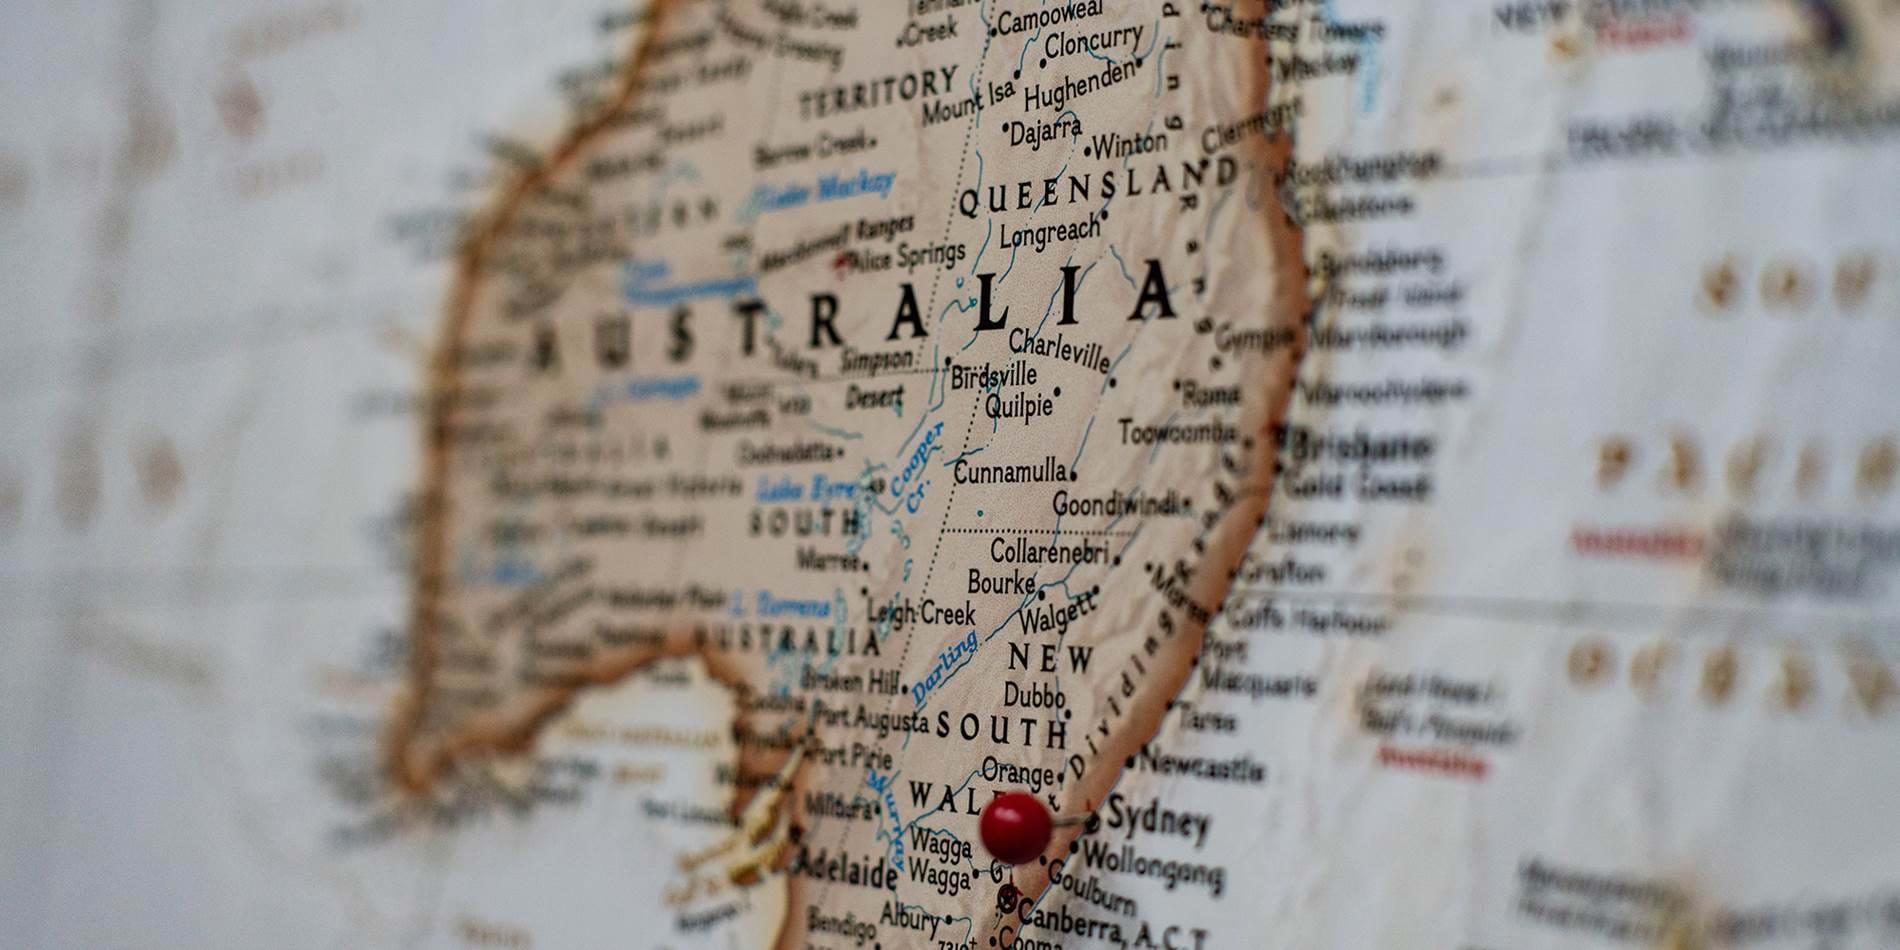 East Coast Australia Road Map.East Coast Road Trip Australia Roadtrip Australia Kilroy